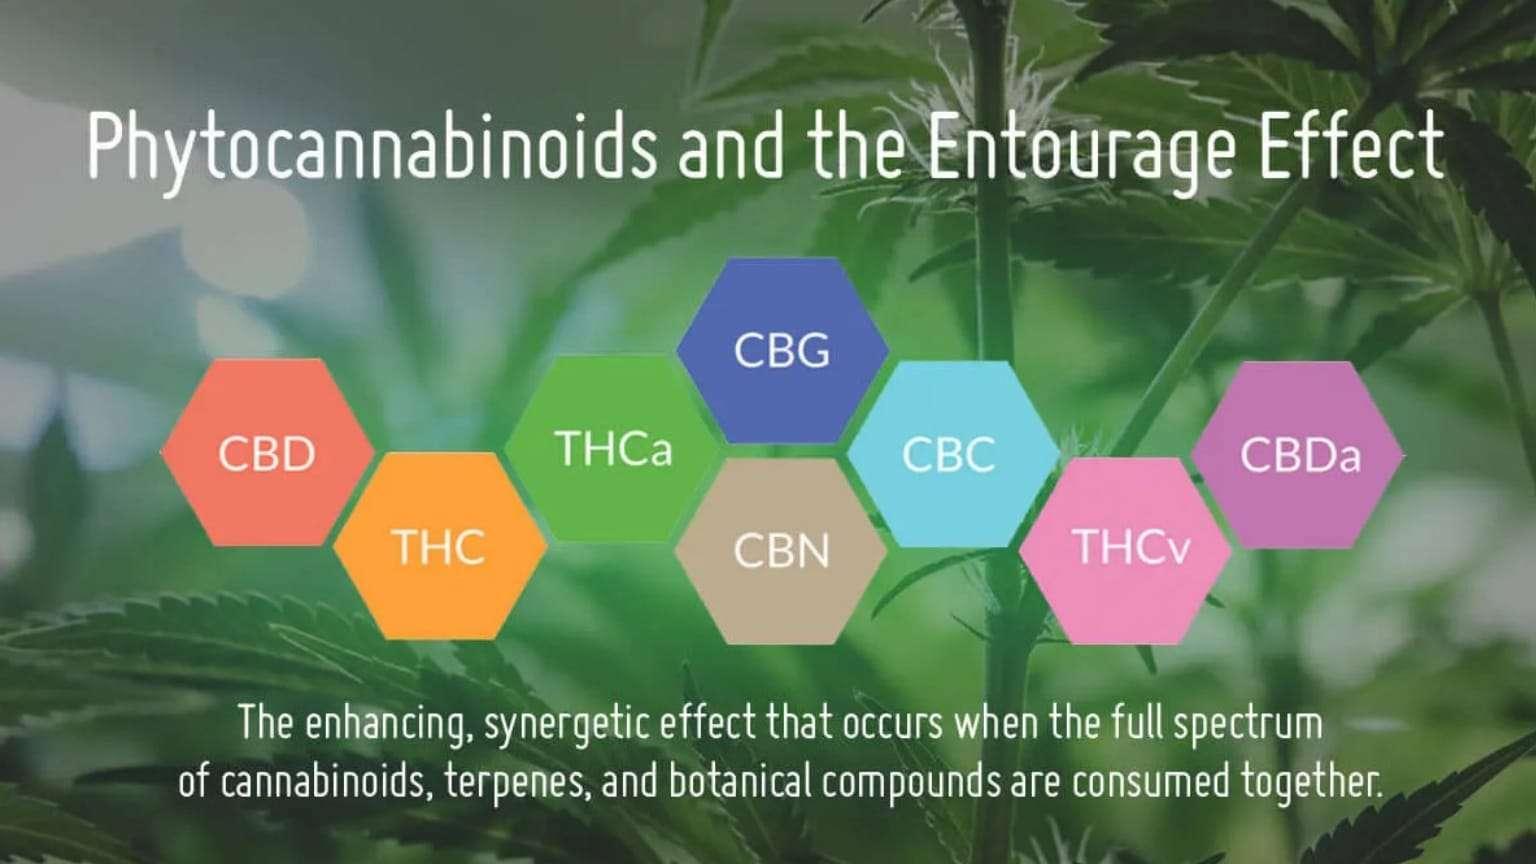 phytocannabinoids-entourage-effect